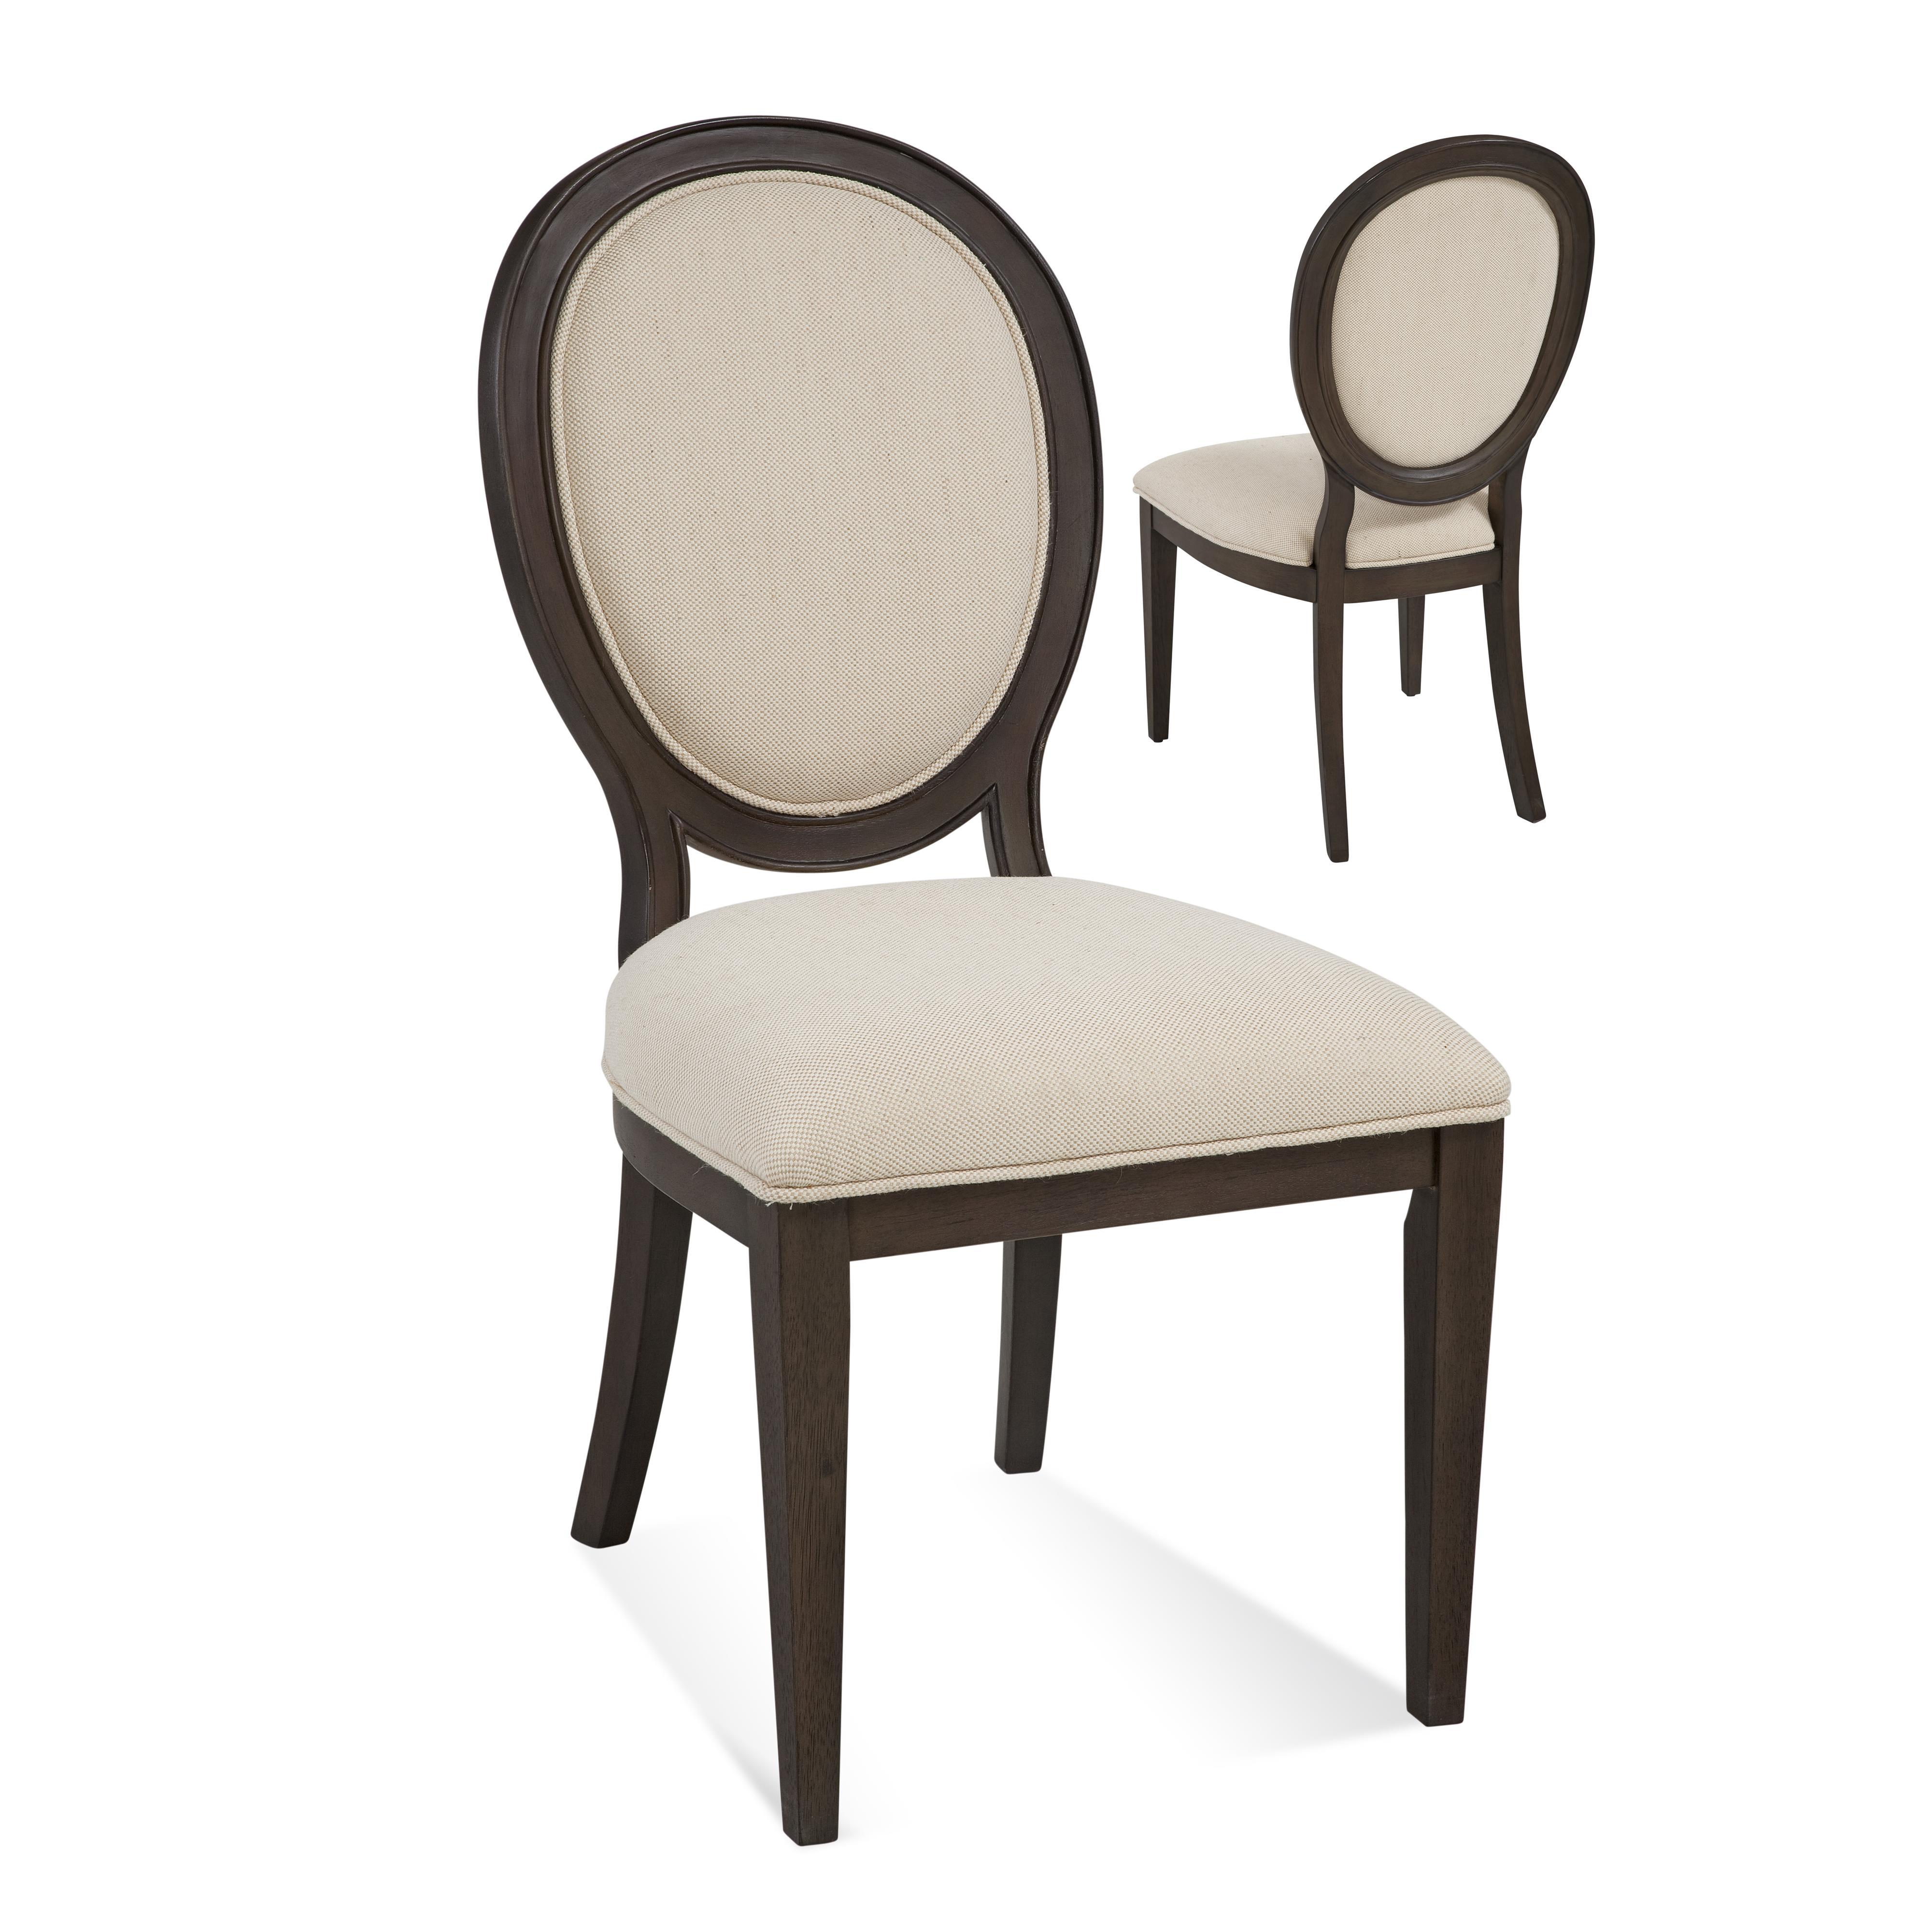 Belgian Luxe Cornelia Side Chair by Bassett Mirror at Alison Craig Home Furnishings